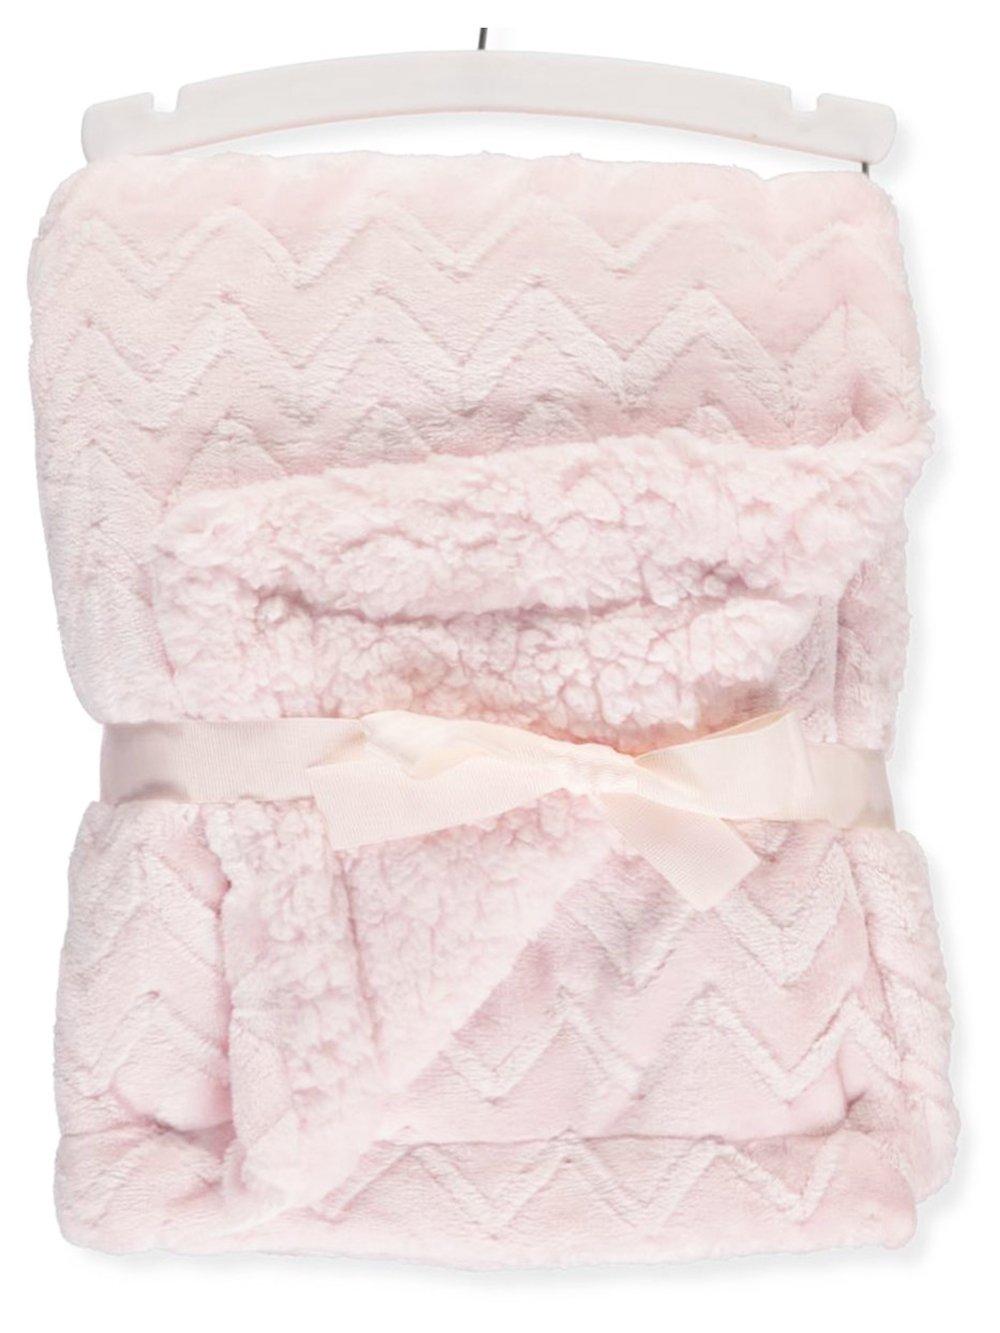 Petit Monde Plush Chevron Blanket - pink, one size